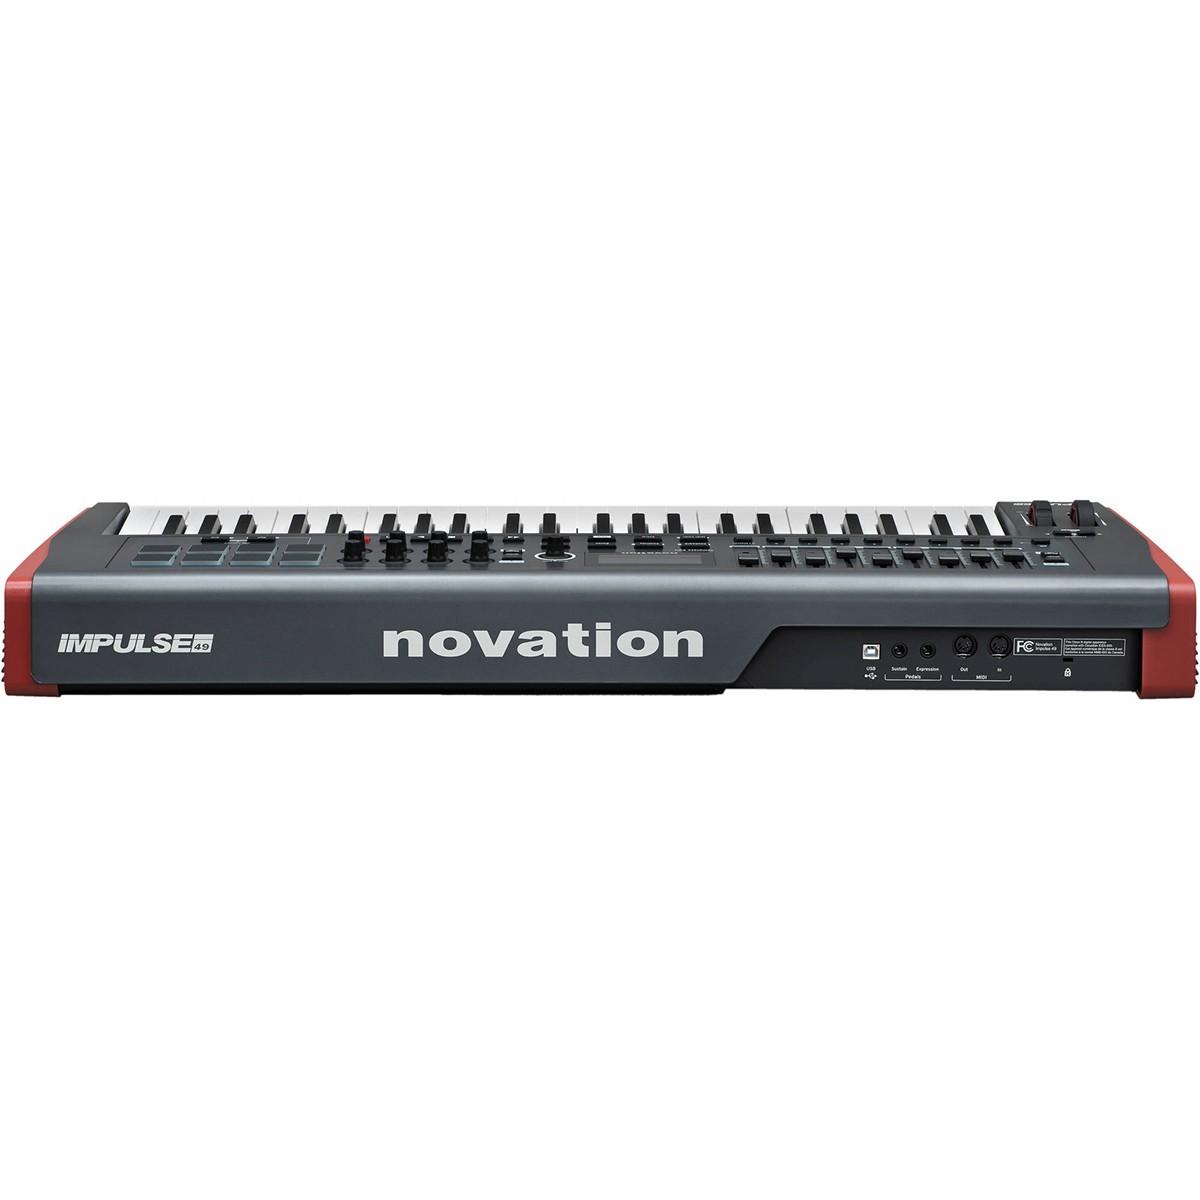 TECLADO CONTROLADOR MIDI USB NOVATION IMPULSE 49